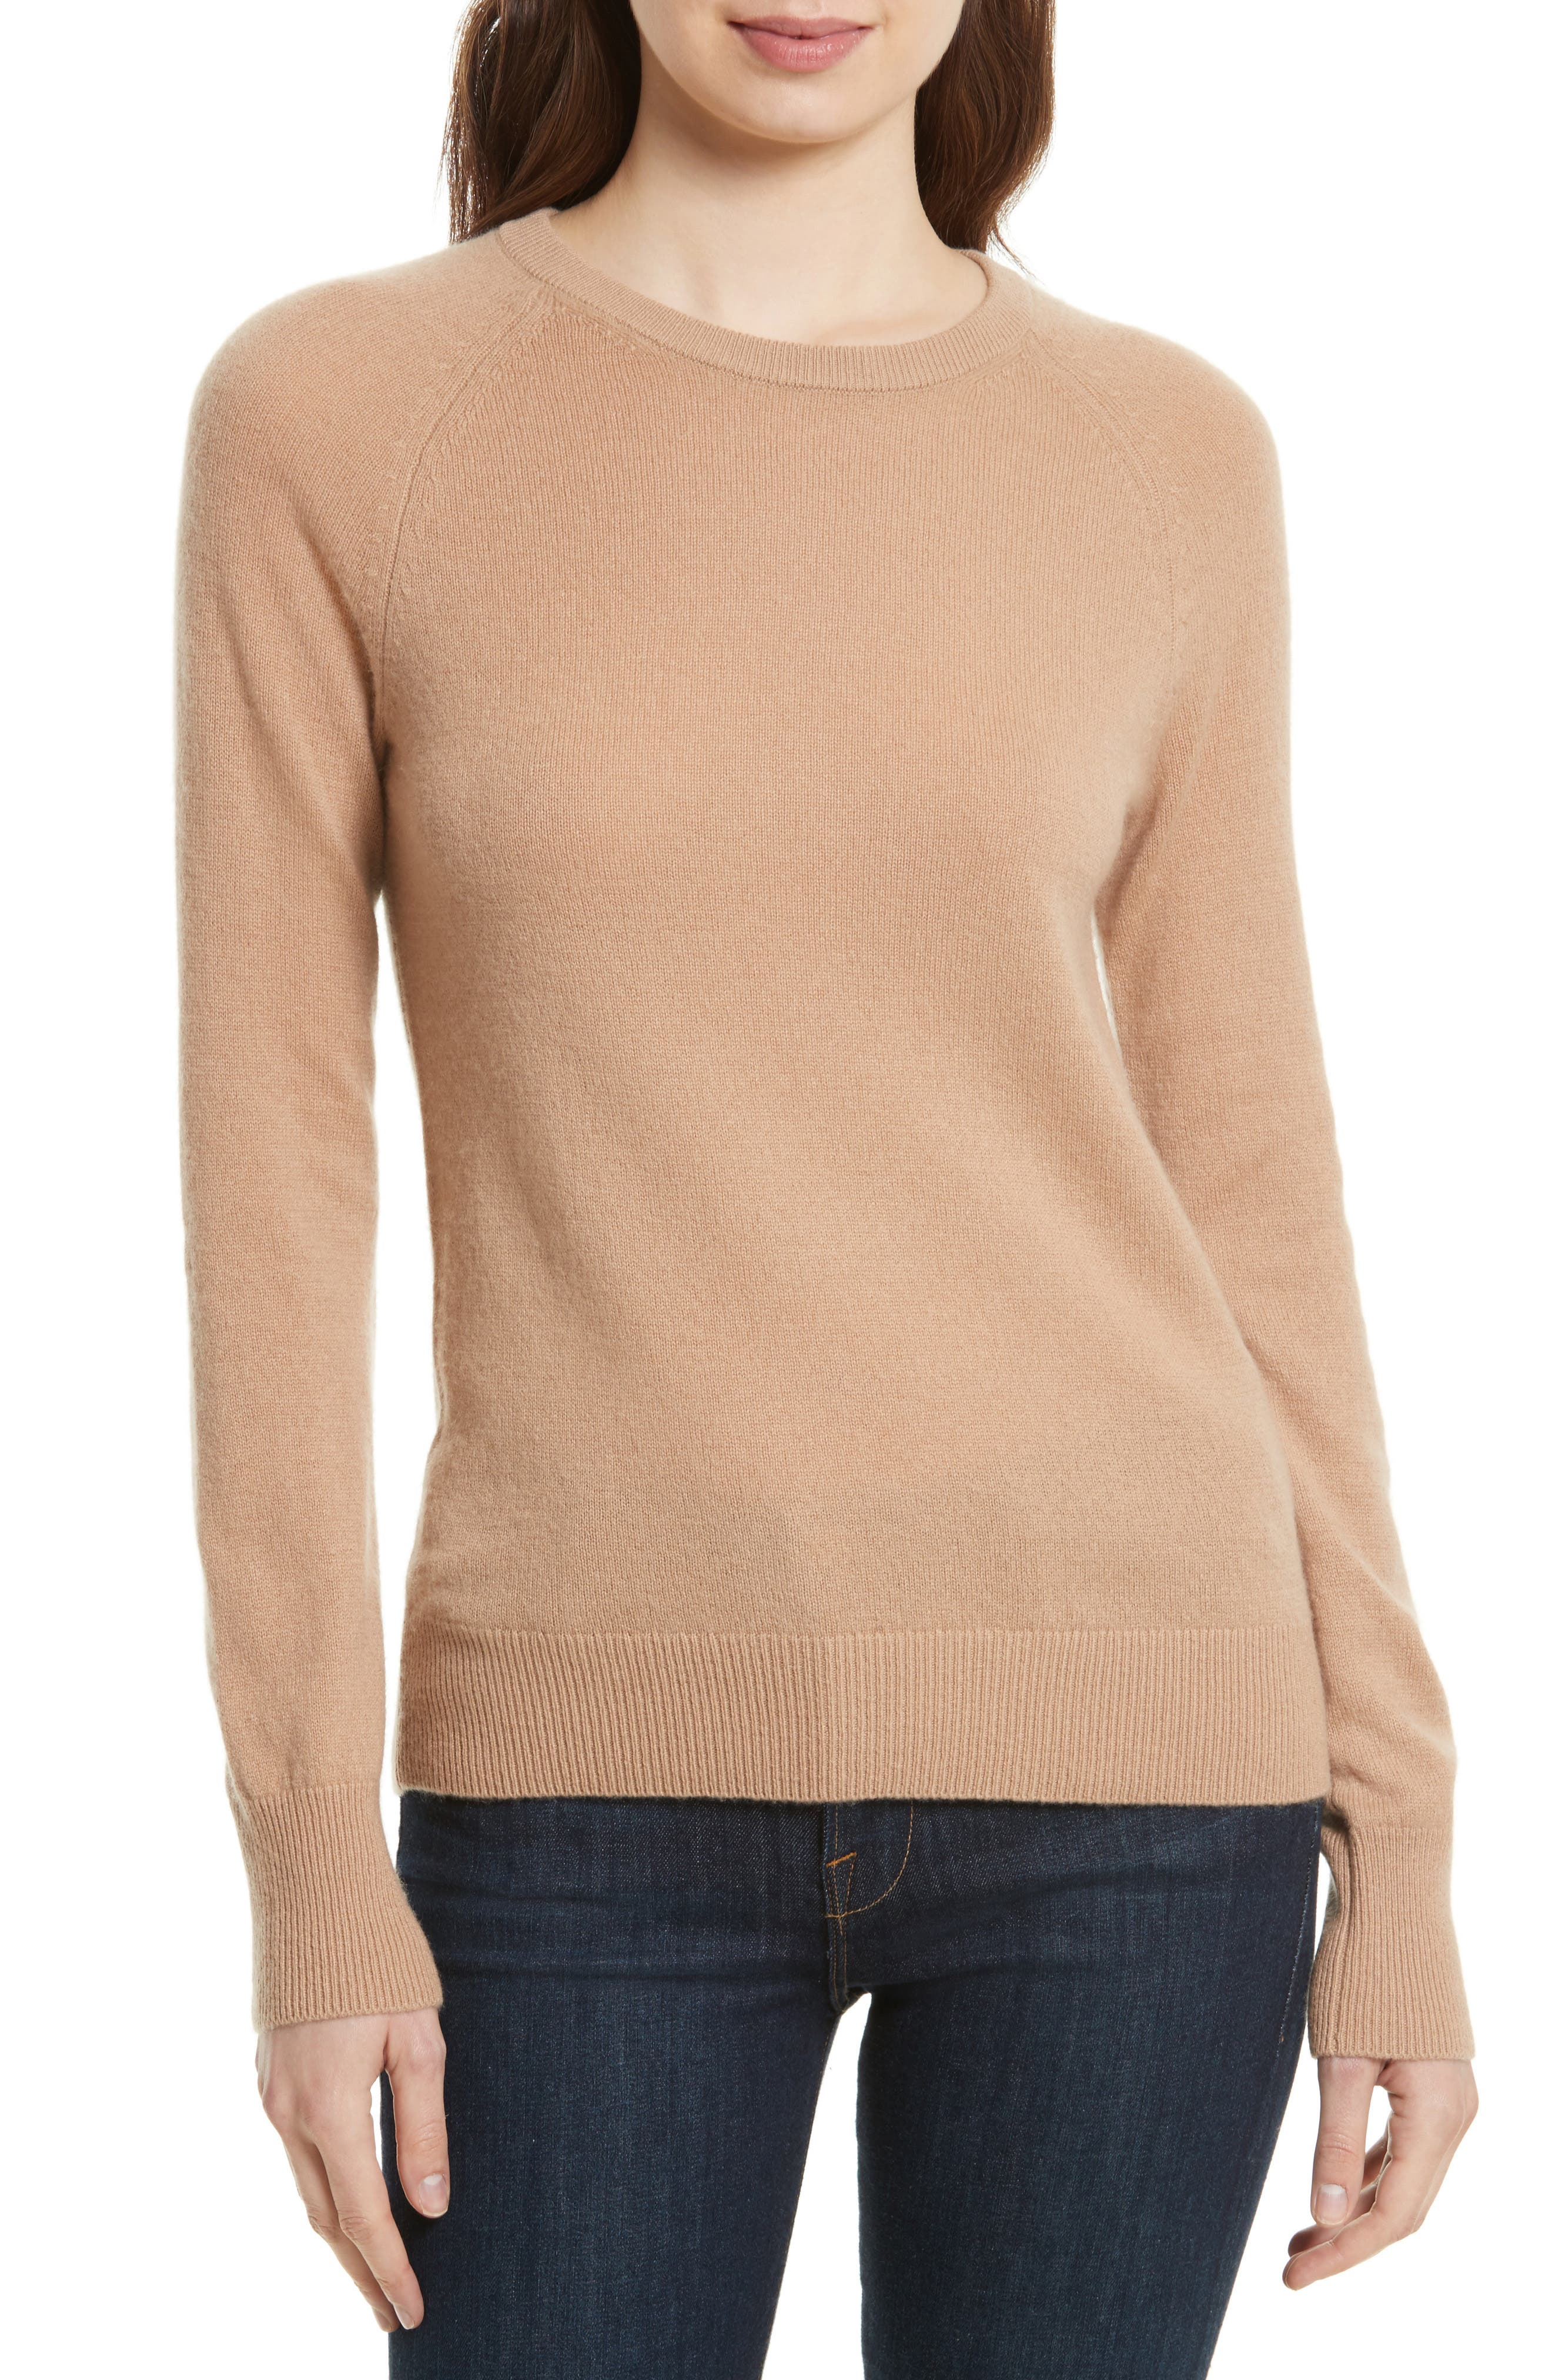 Main Image - Equipment 'Sloane' Crewneck Cashmere Sweater